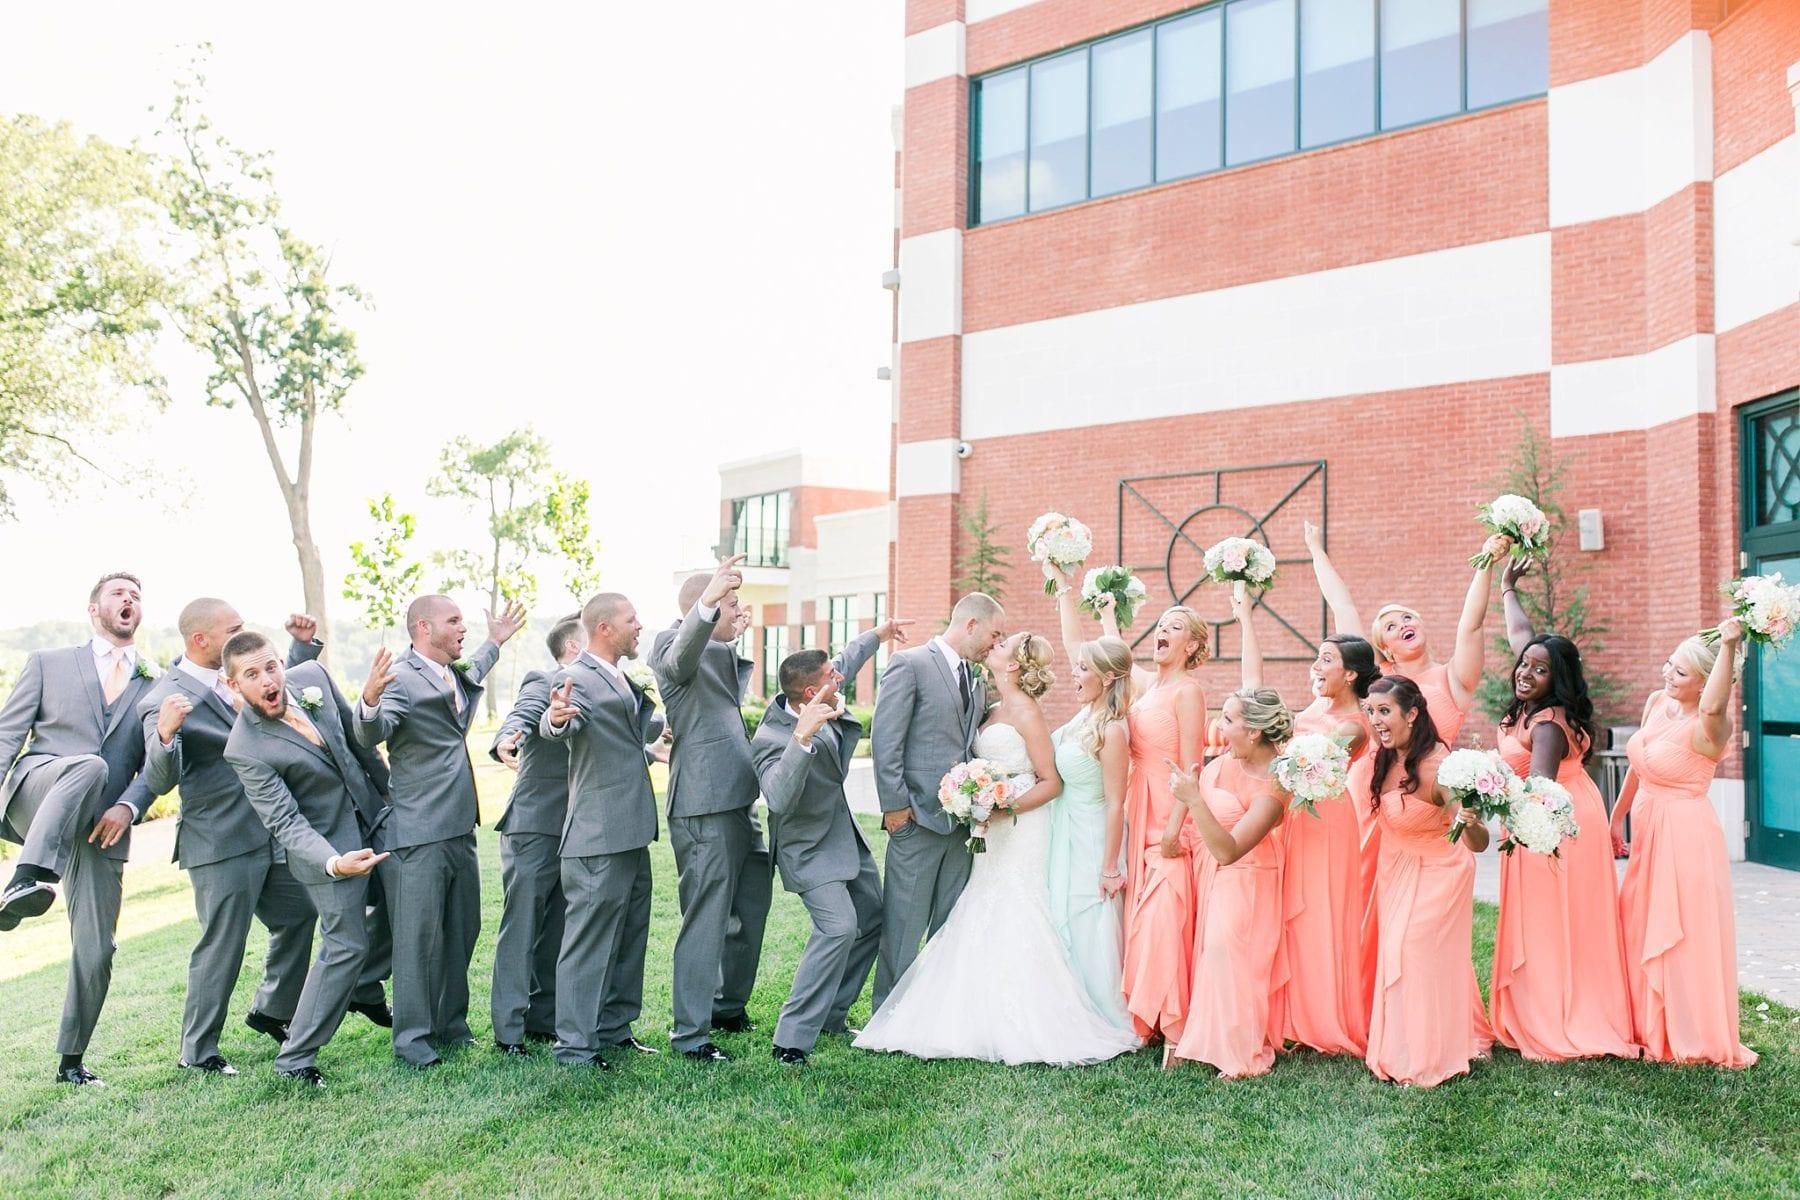 Waters Edge Wedding Photos Maryland Wedding Photographer Megan Kelsey Photography Katie & Conor-353.JPG